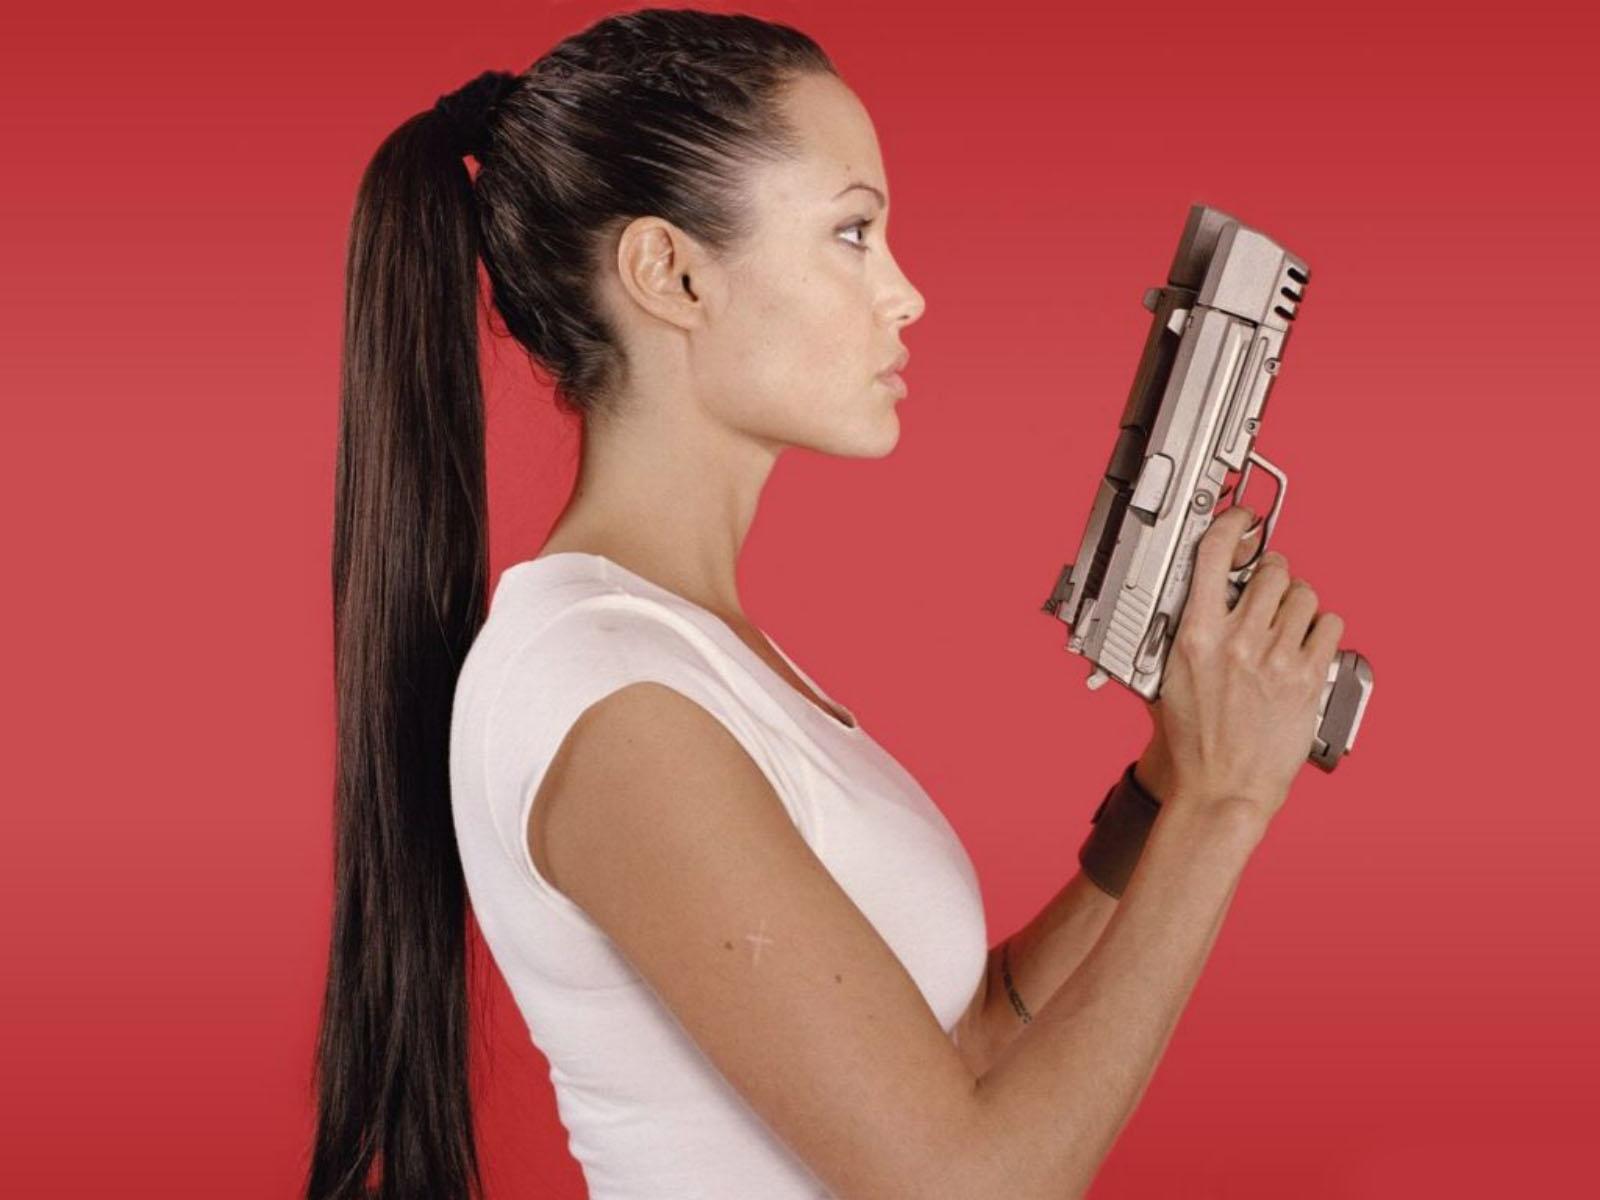 Angelina Jolie Hair Styles: Angelina Jolie Ponytail Hairstyle